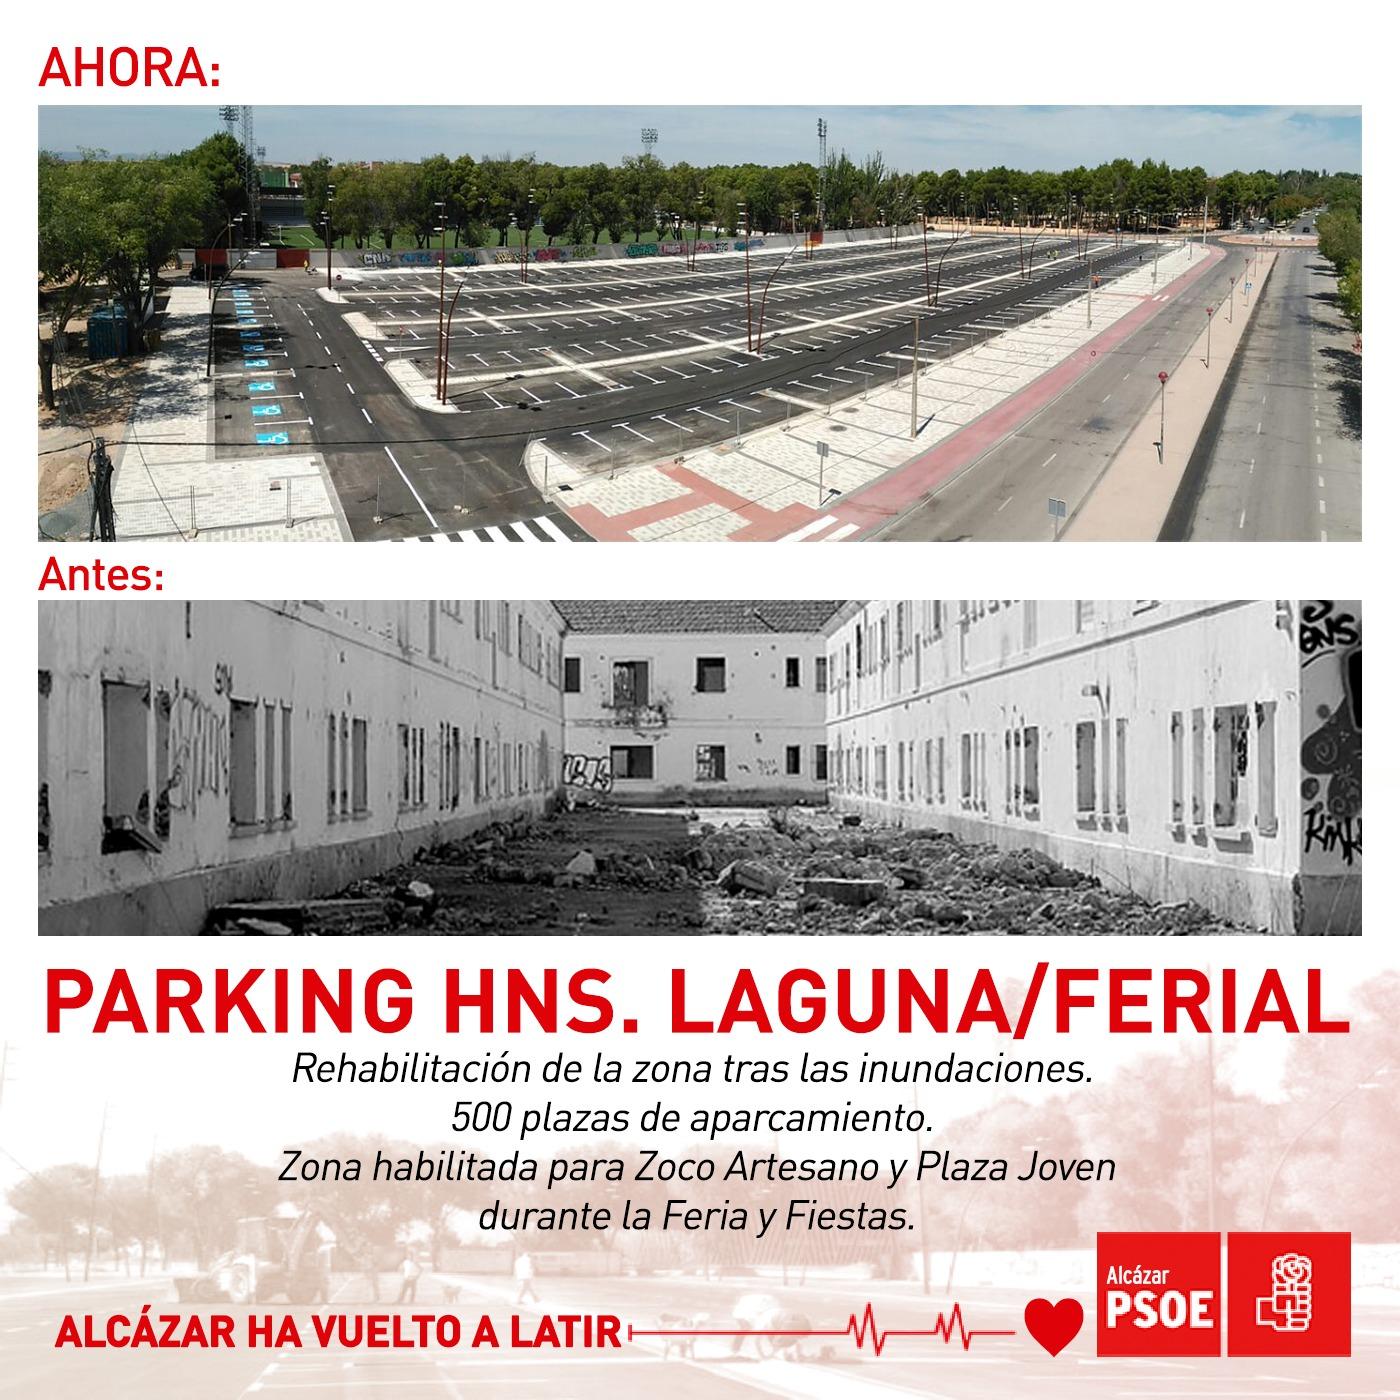 Parking Hermanos Laguna - Ferial